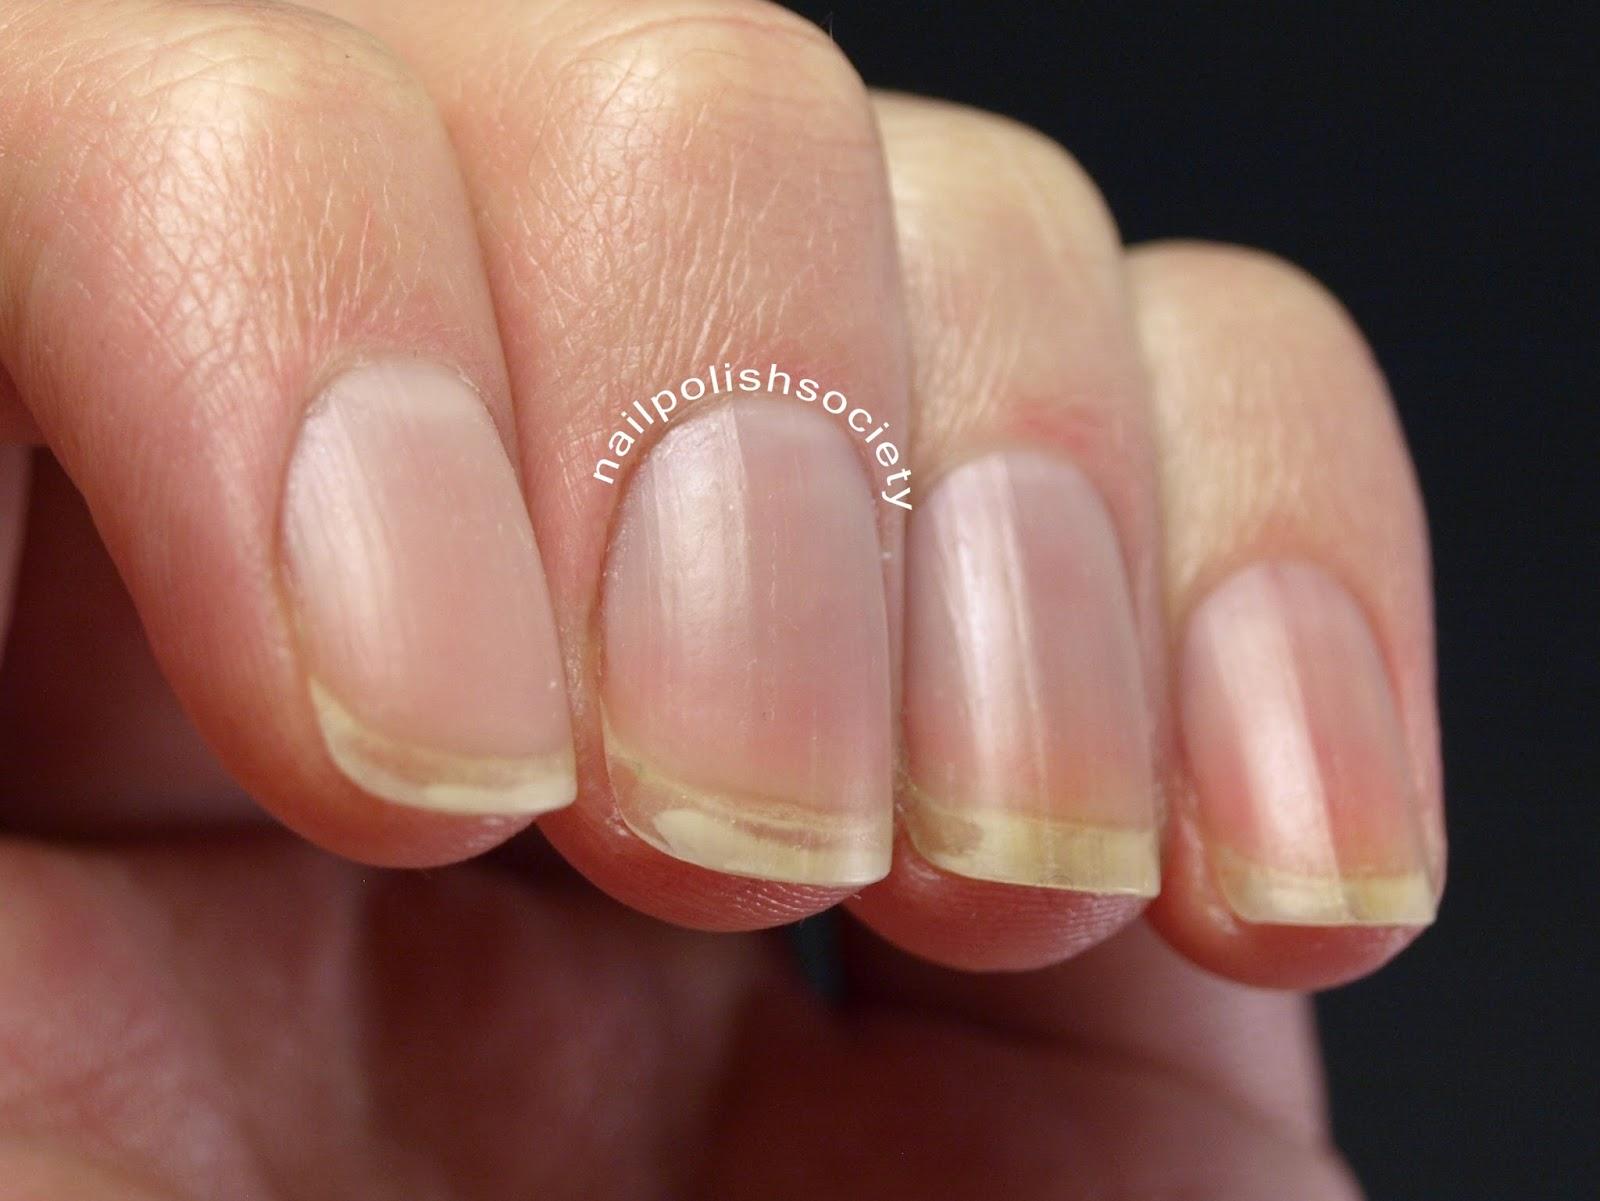 Nail Polish Society: Lent Manicure... My Very Naked Nails and Nail Care